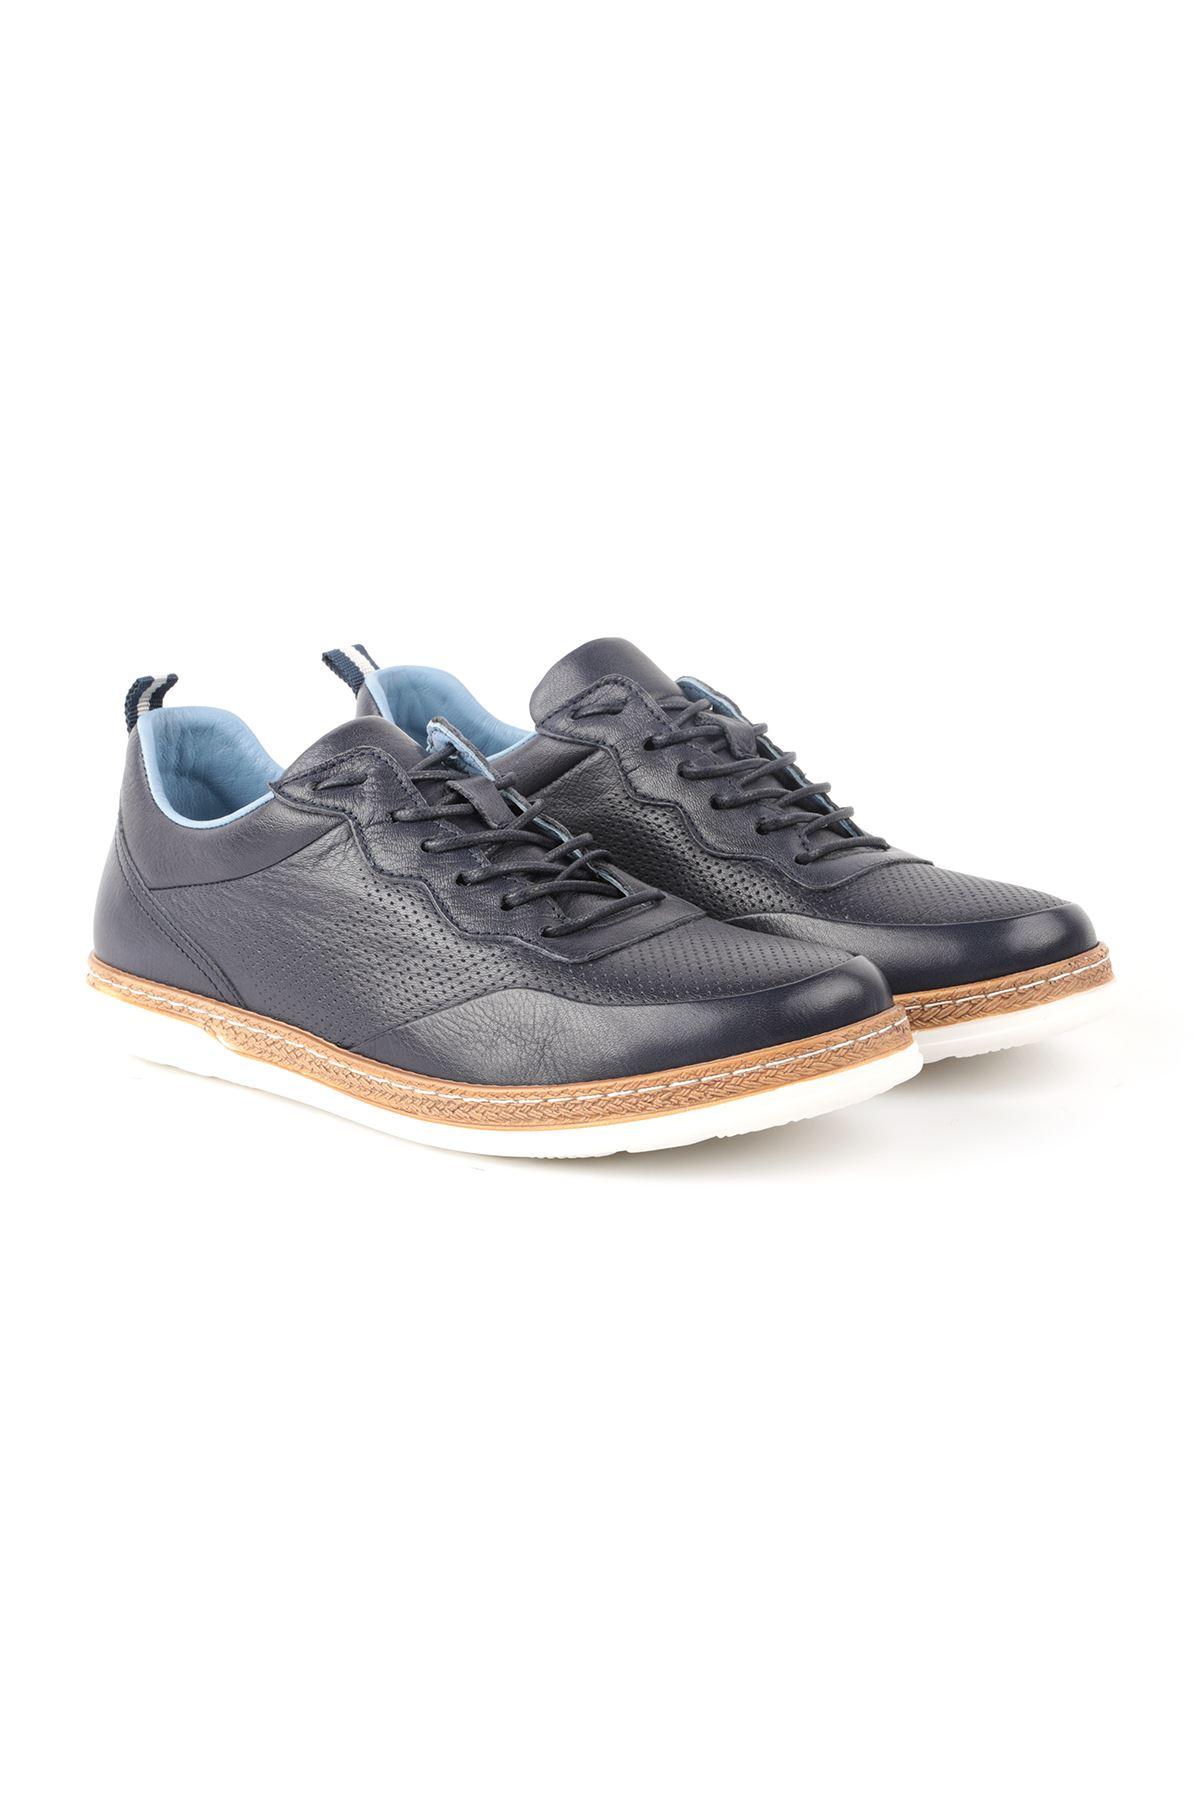 Libero L846 Lacivert Casual Erkek Ayakkabı